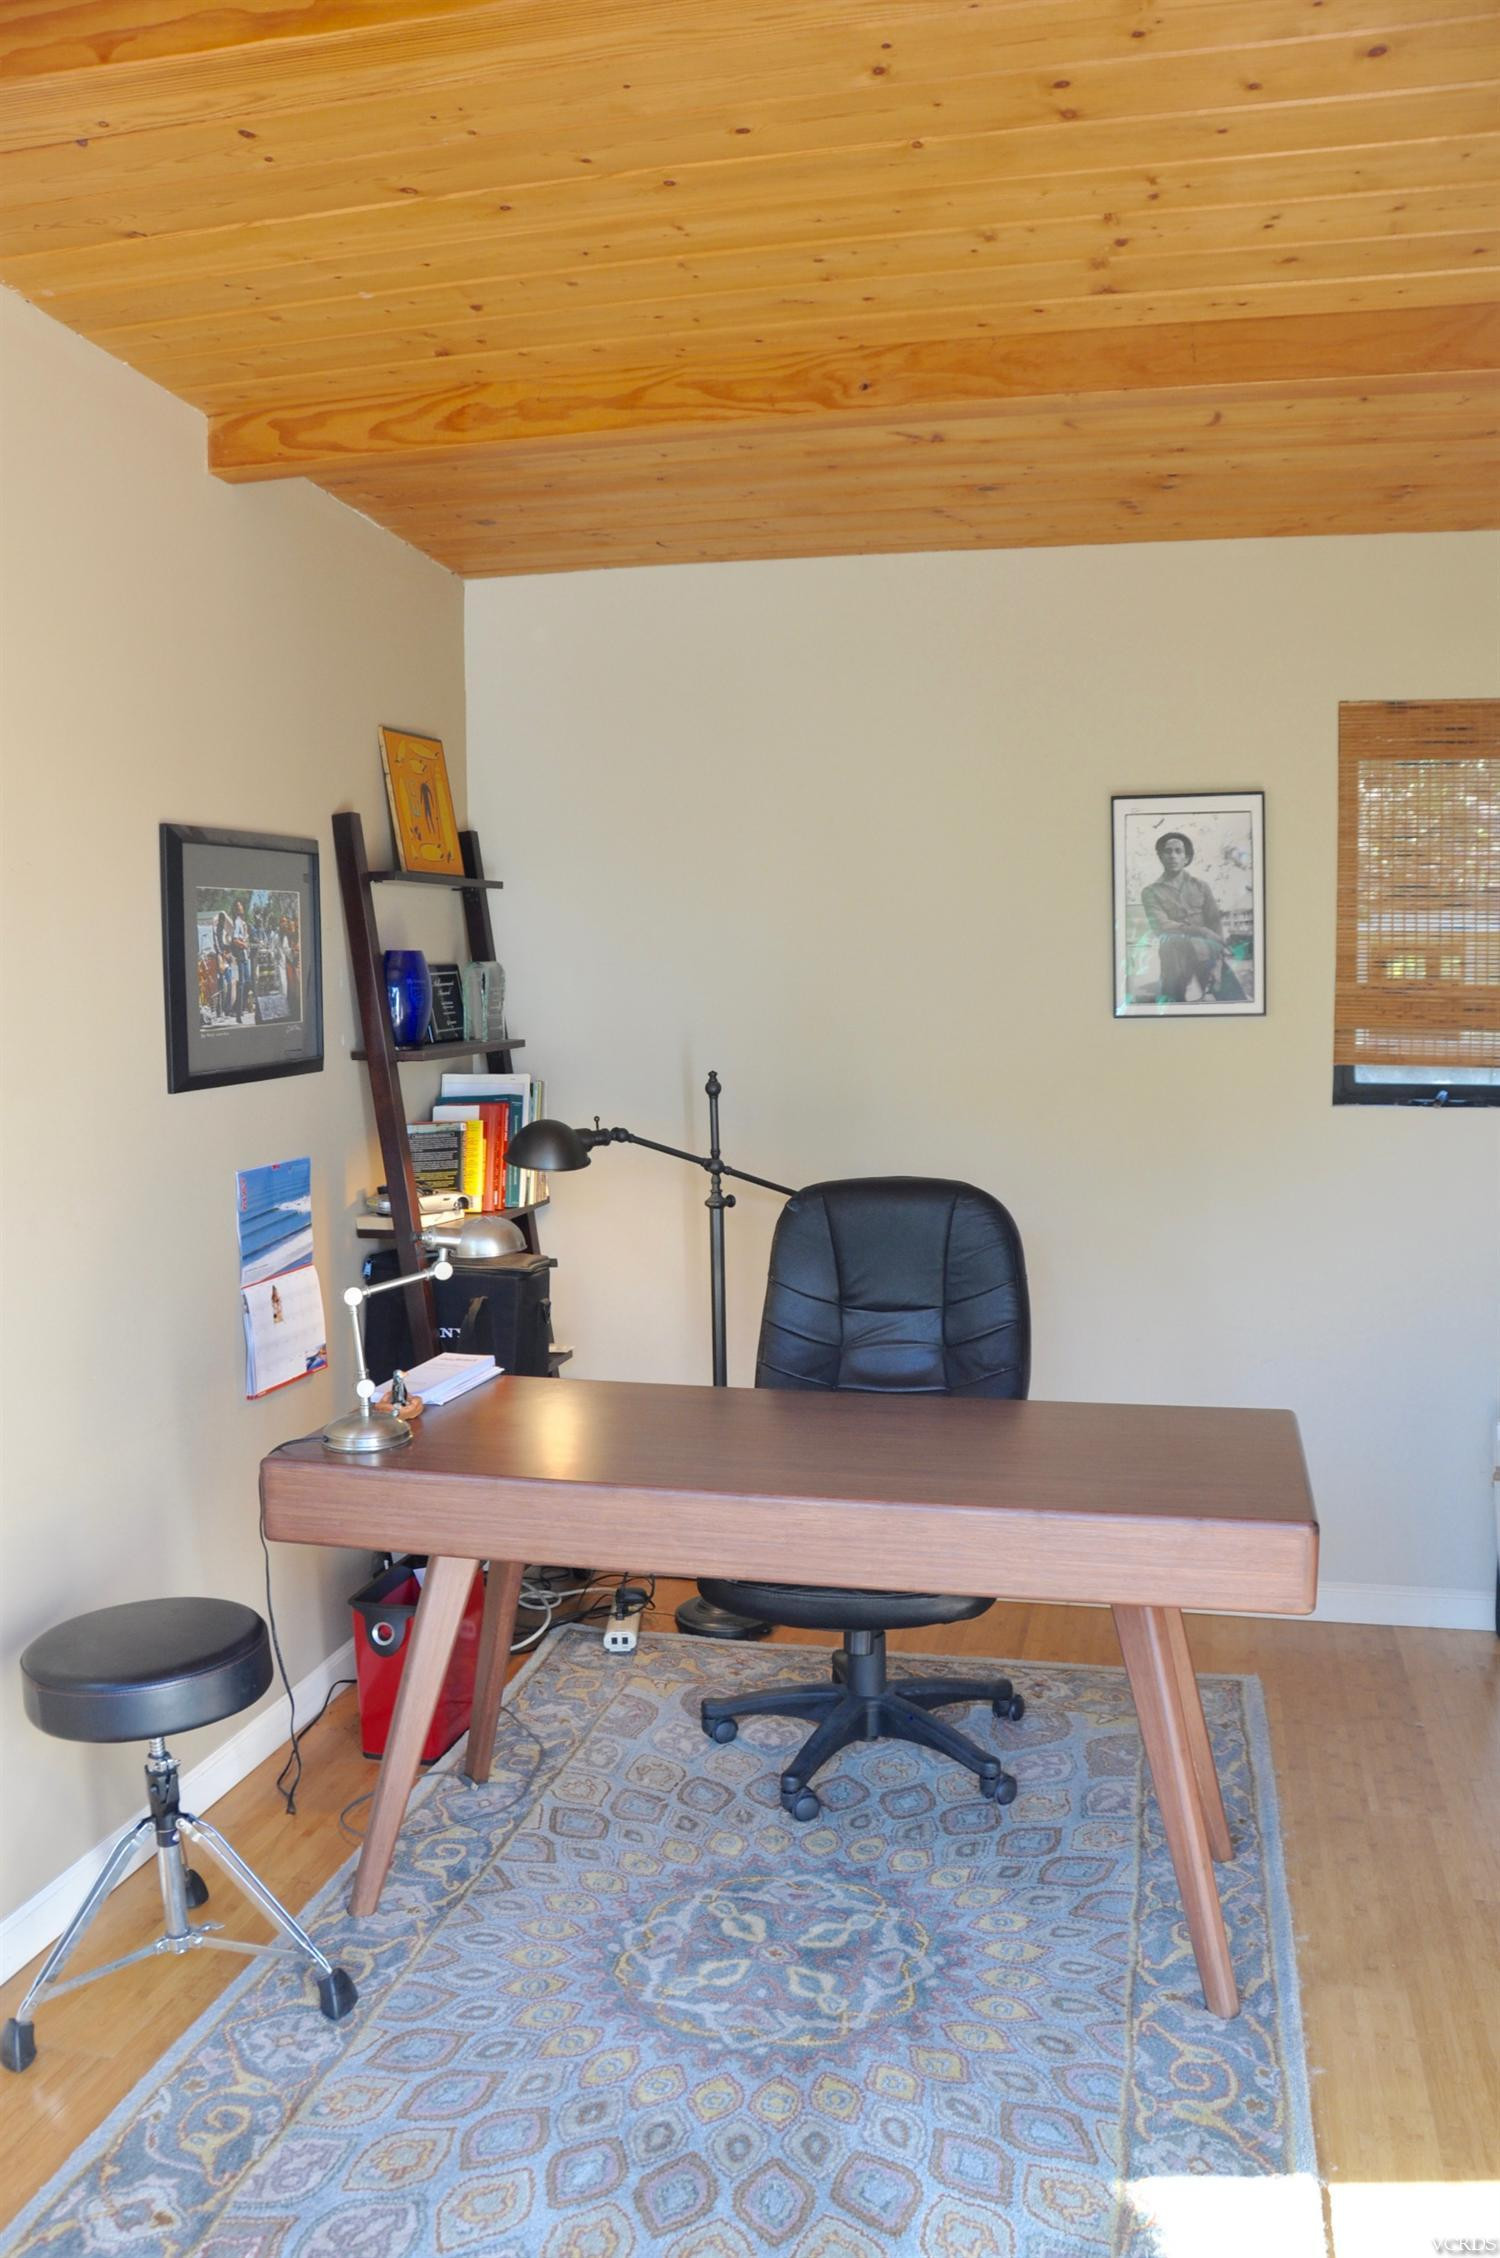 hardwood flooring ventura ca of listing 331 rancho drive ventura ca mls 216006739 oxnard and with 4 28